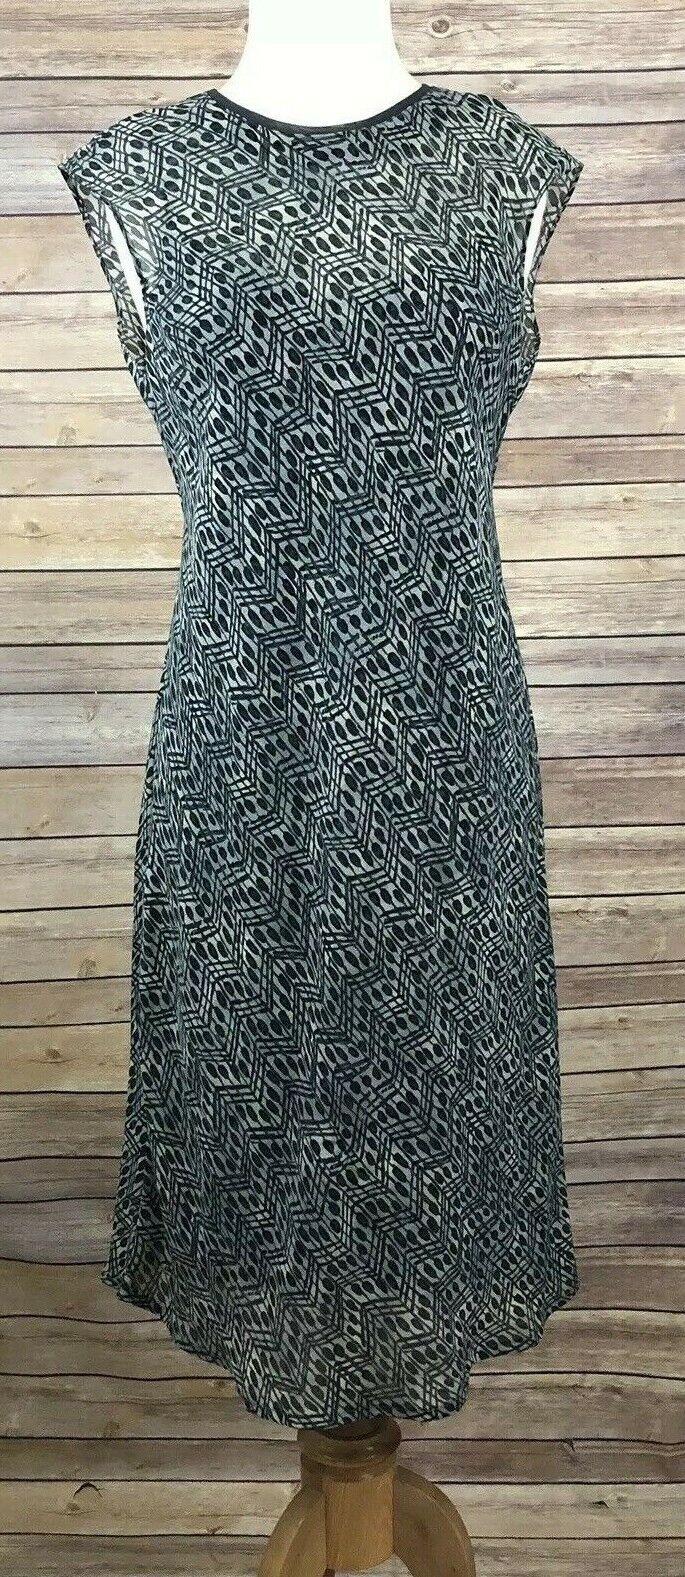 Carole Little Romantic Flowy Cap Sleeve A-Line Dress w Removable Lining Sz 6